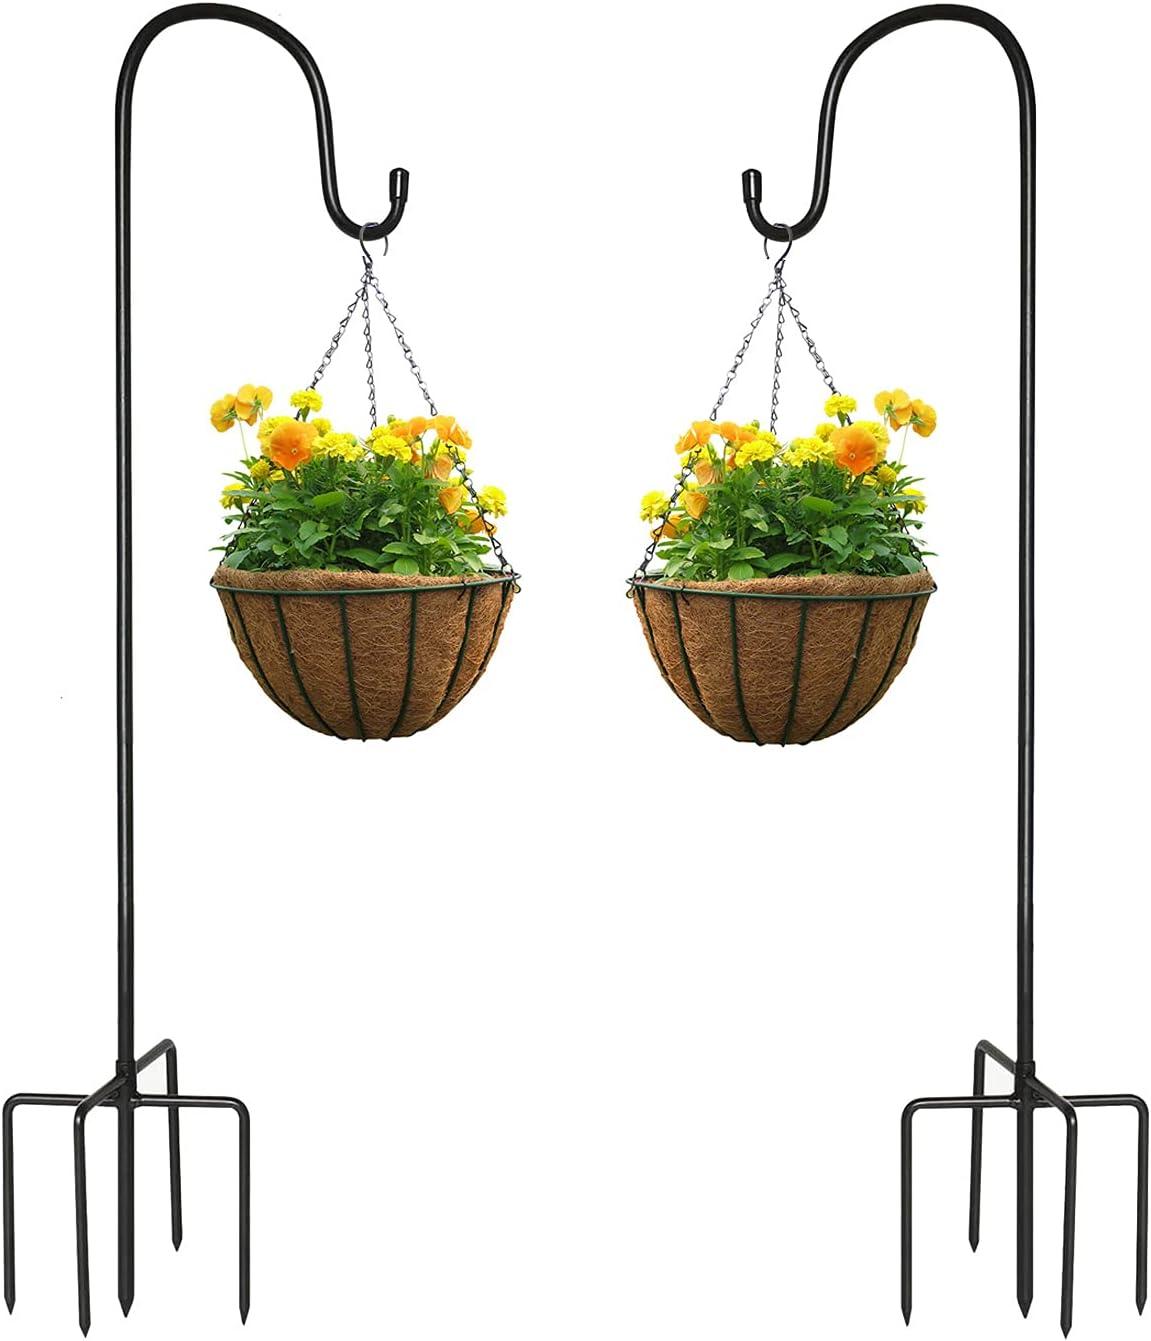 2 Pack Bird Feeder Pole, 38Inch Adjustable Heavy Duty Shepherds Hooks, 5 Prong Plant Hangers Outdoors Metal Hanger Hooks for Garden Plant Hooks for Wedding Decor (Black)